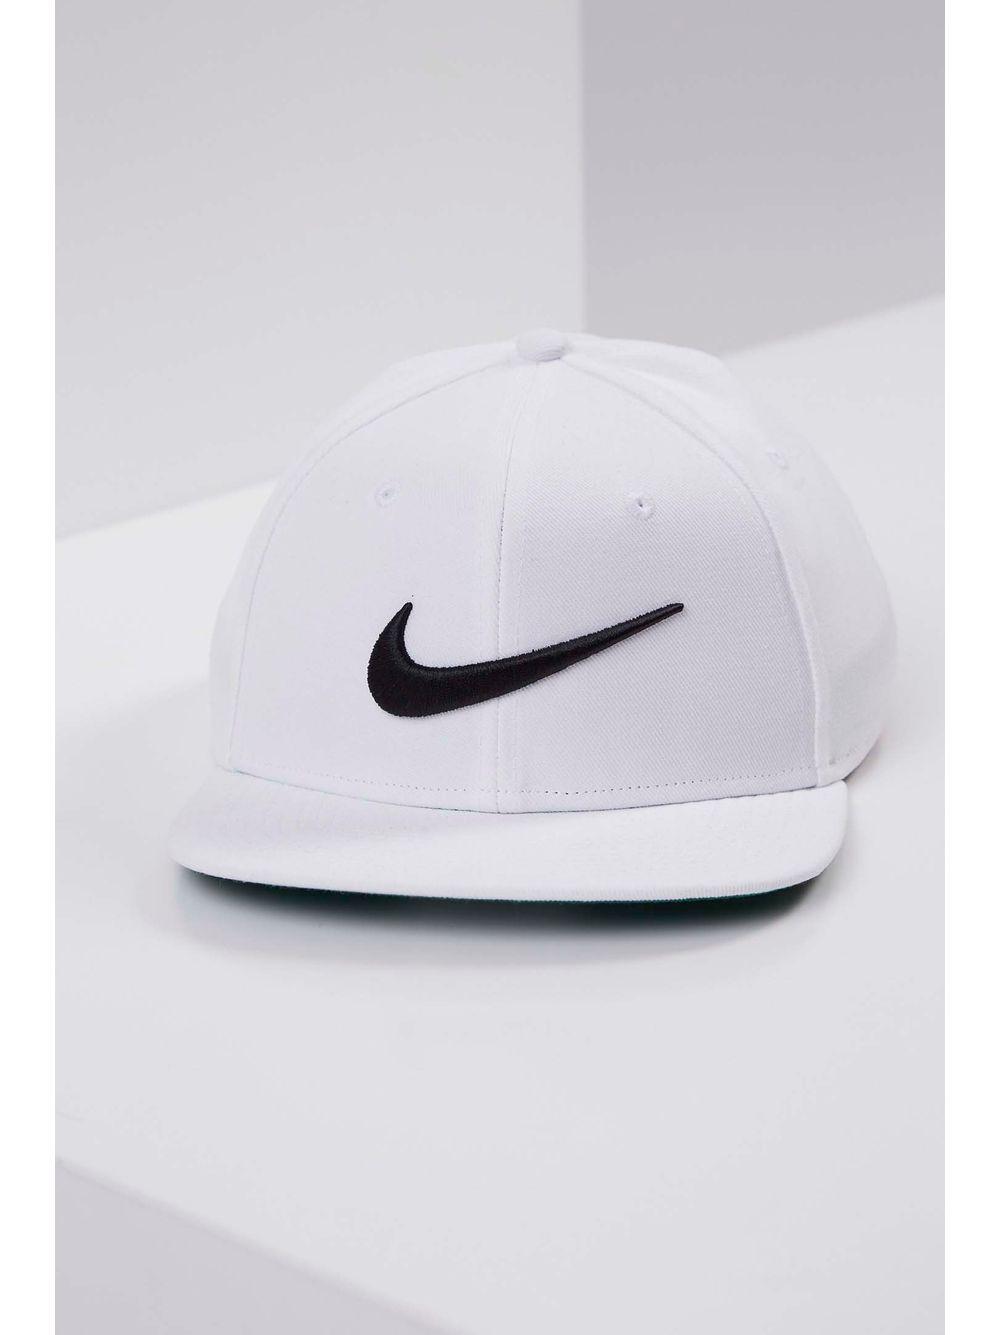 Boné Nike Sportswear Pro Swoosh Classic Hat Branco - pittol 4b00fd4910d15